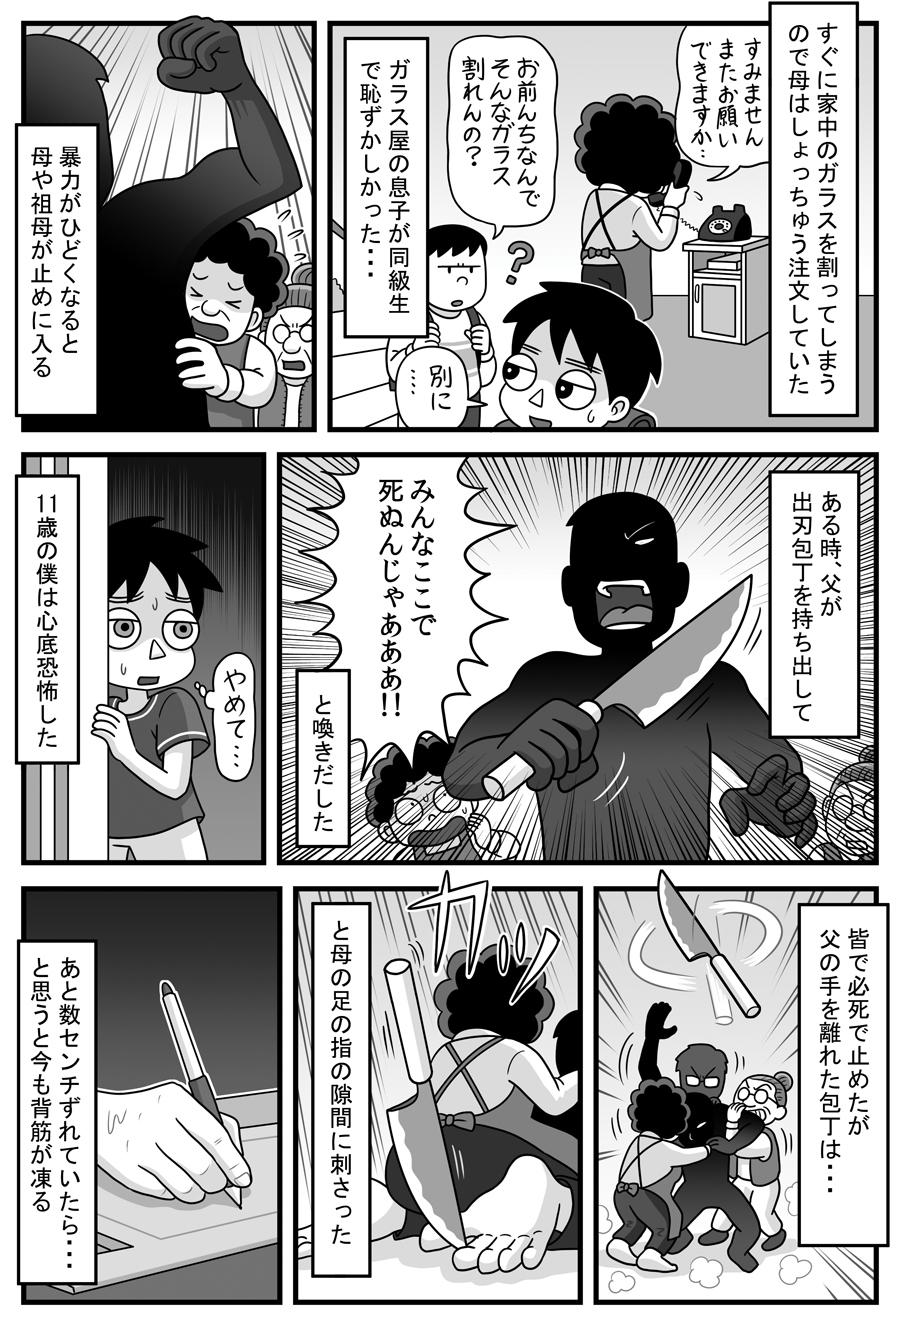 tokonokubo-b09-P02.jpg